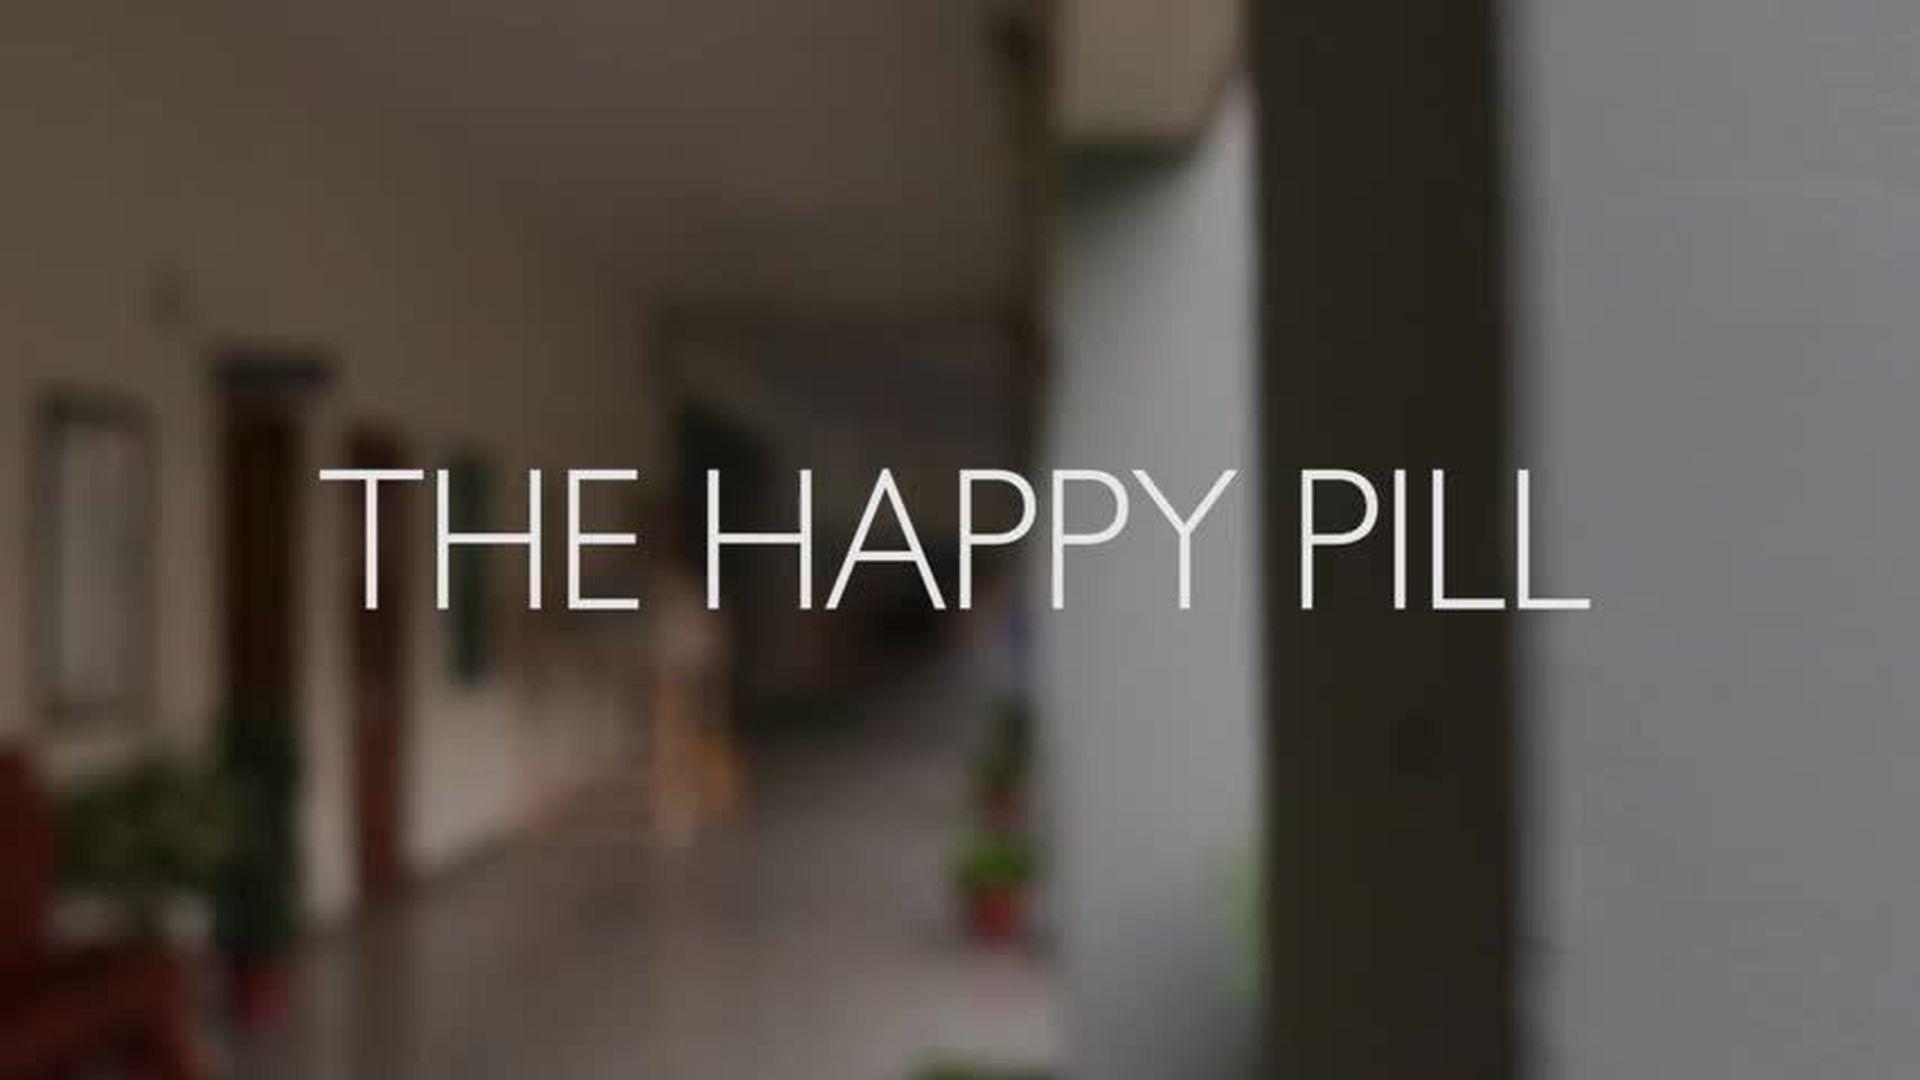 The Happy Pill